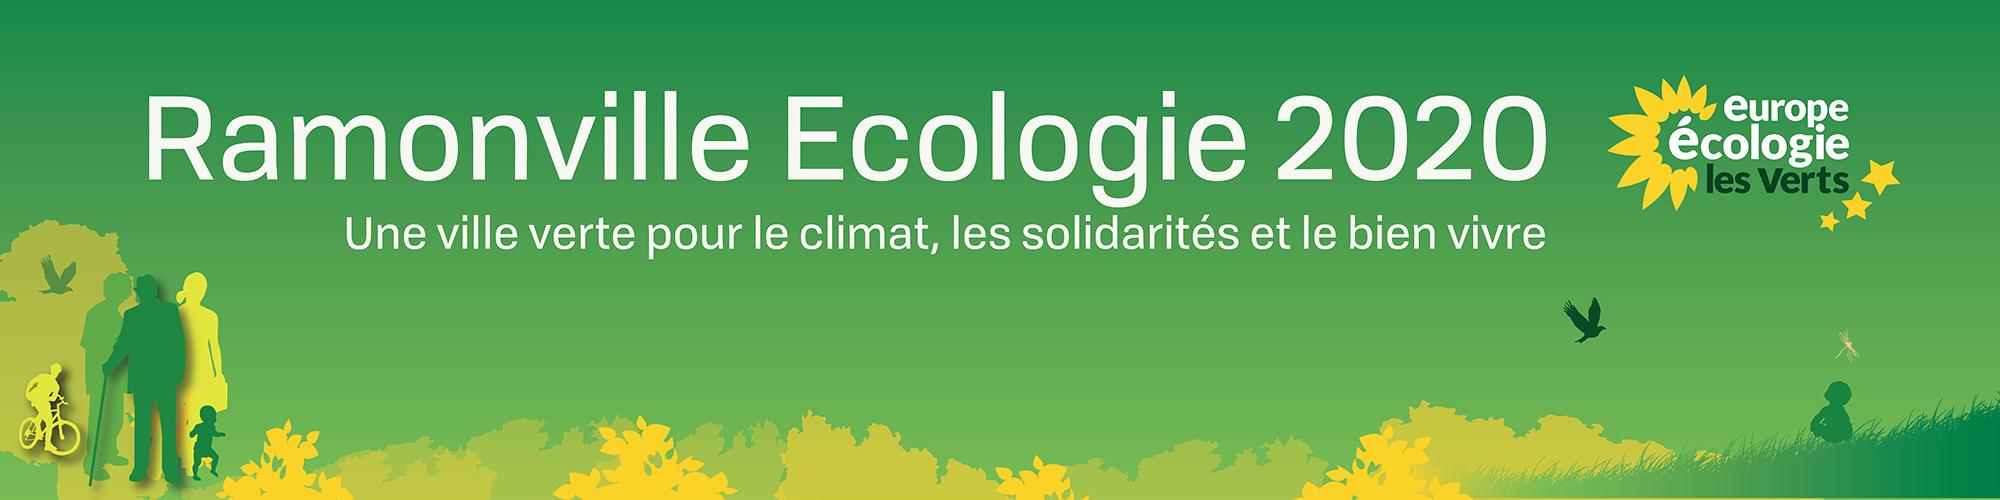 logo ramonville ecologie 2020